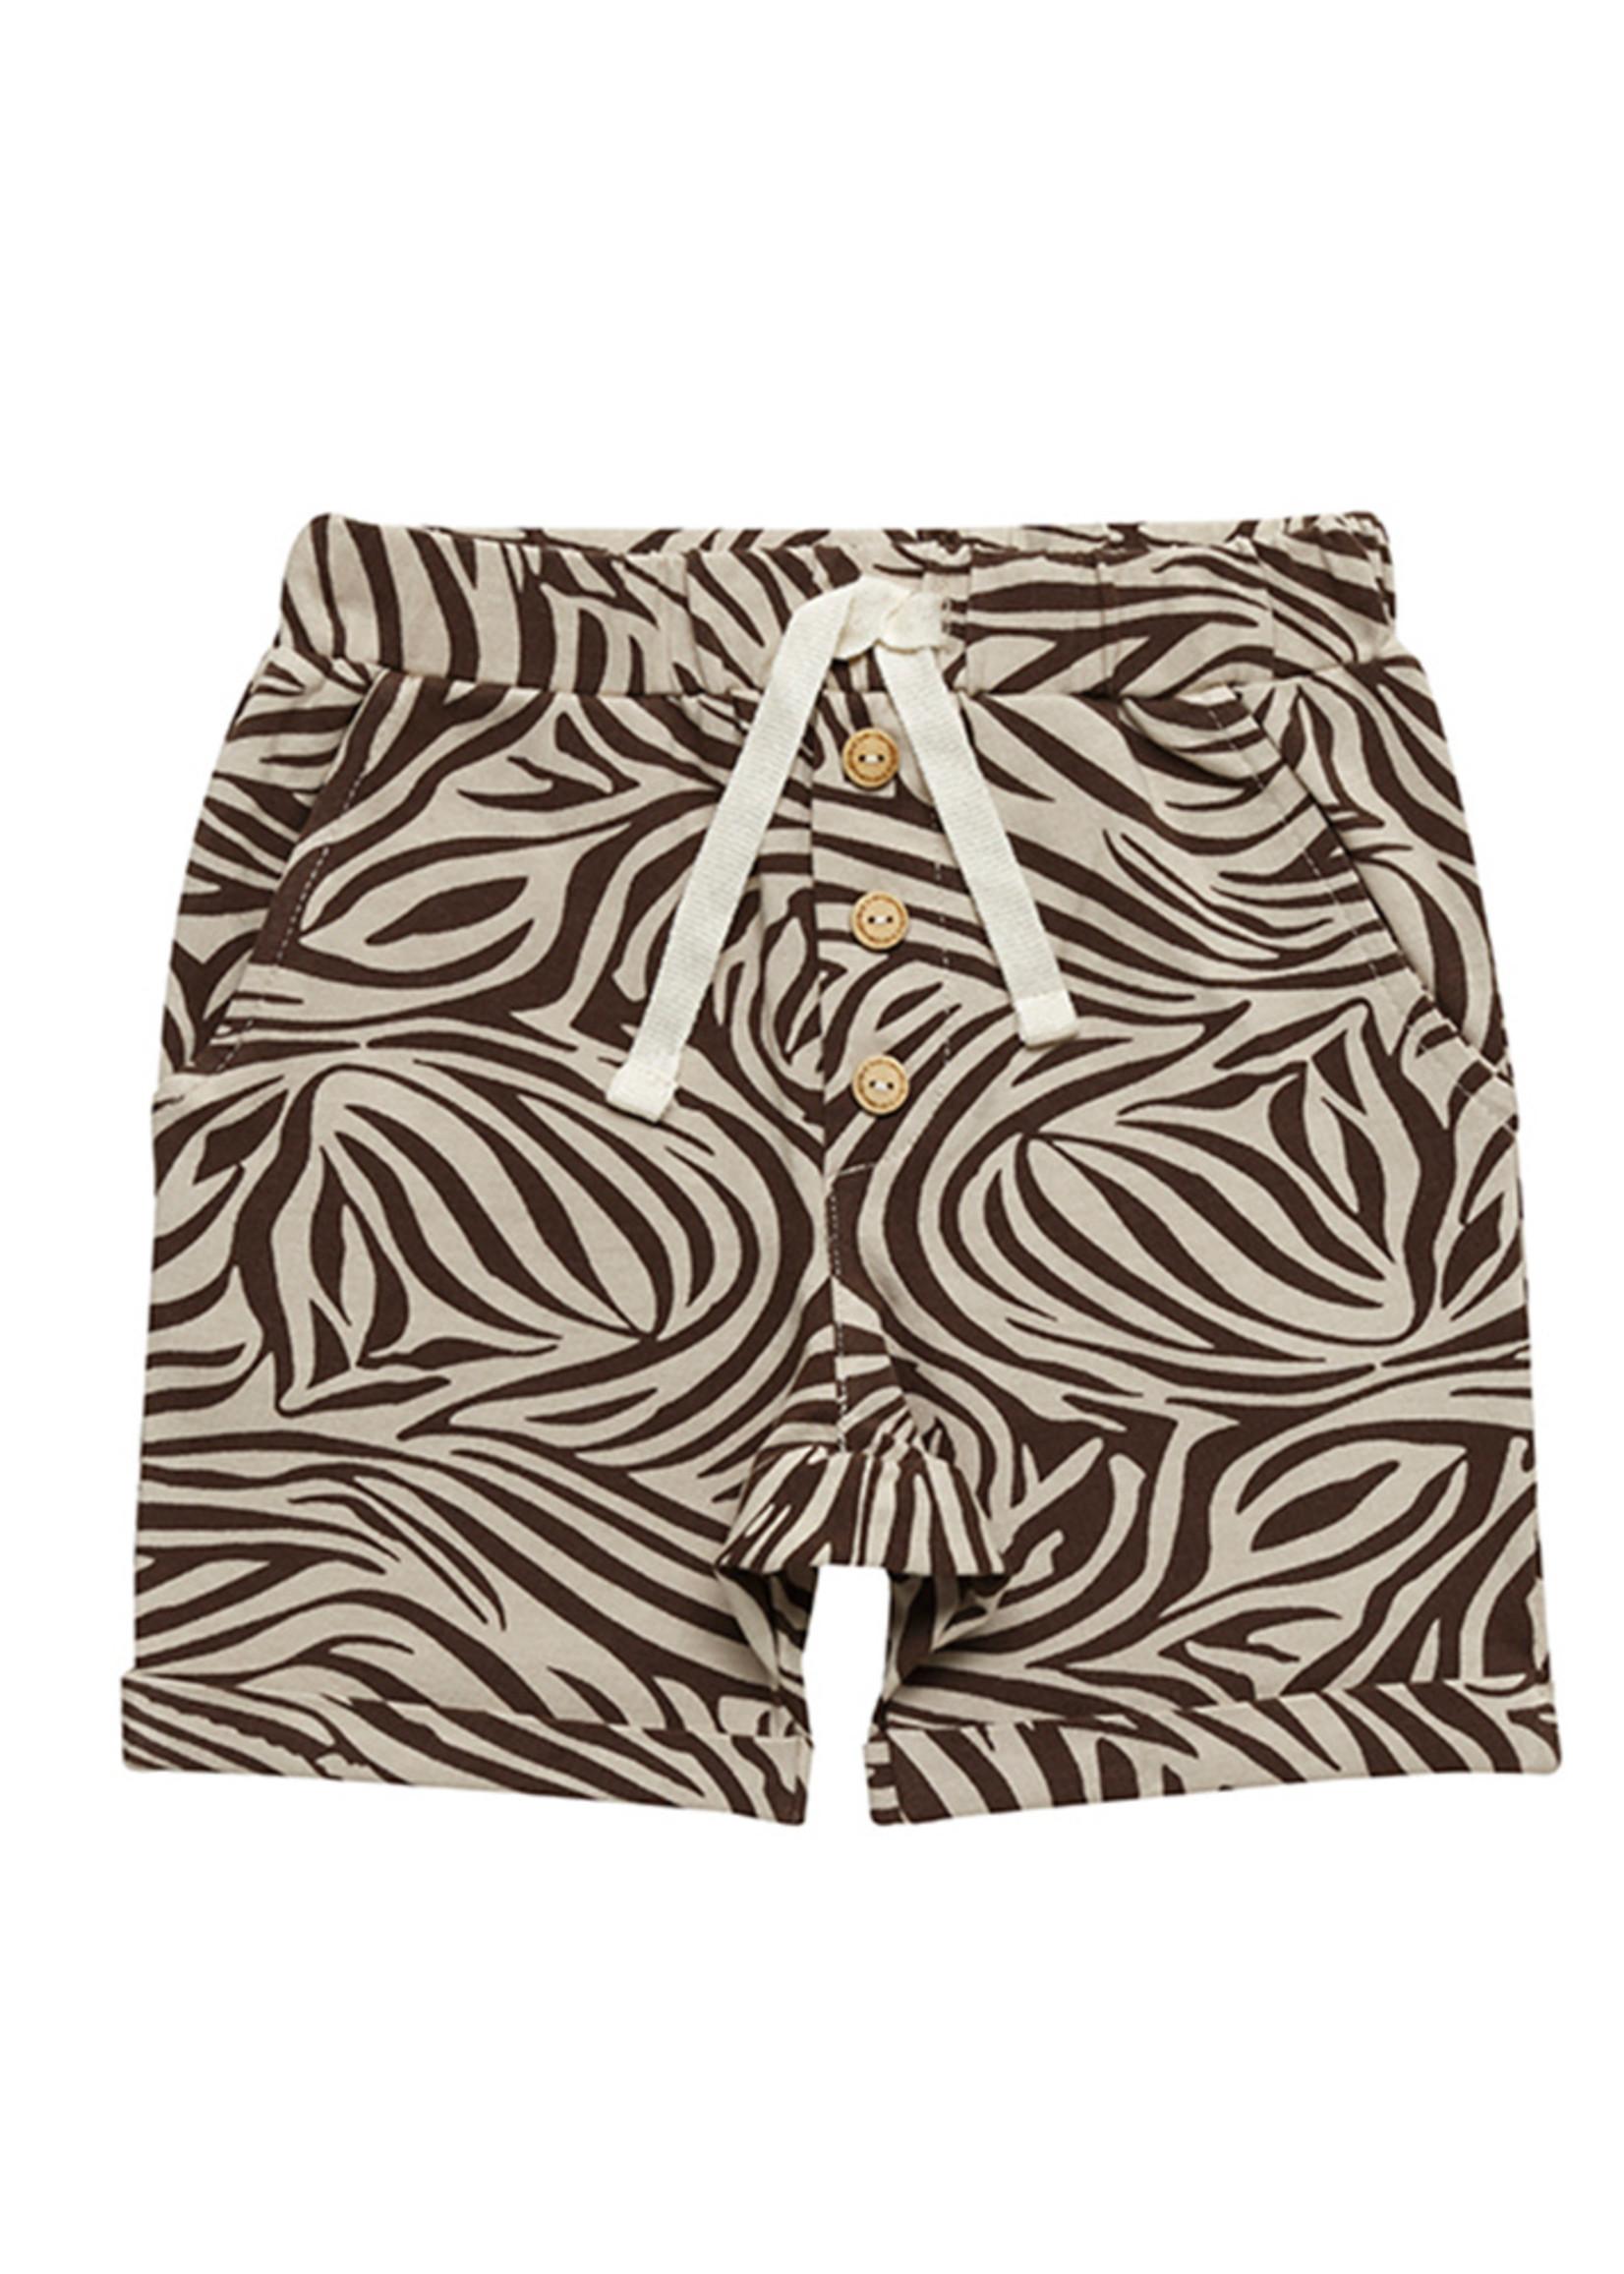 Little Indians LI - Short Zebra Fondue Fudge